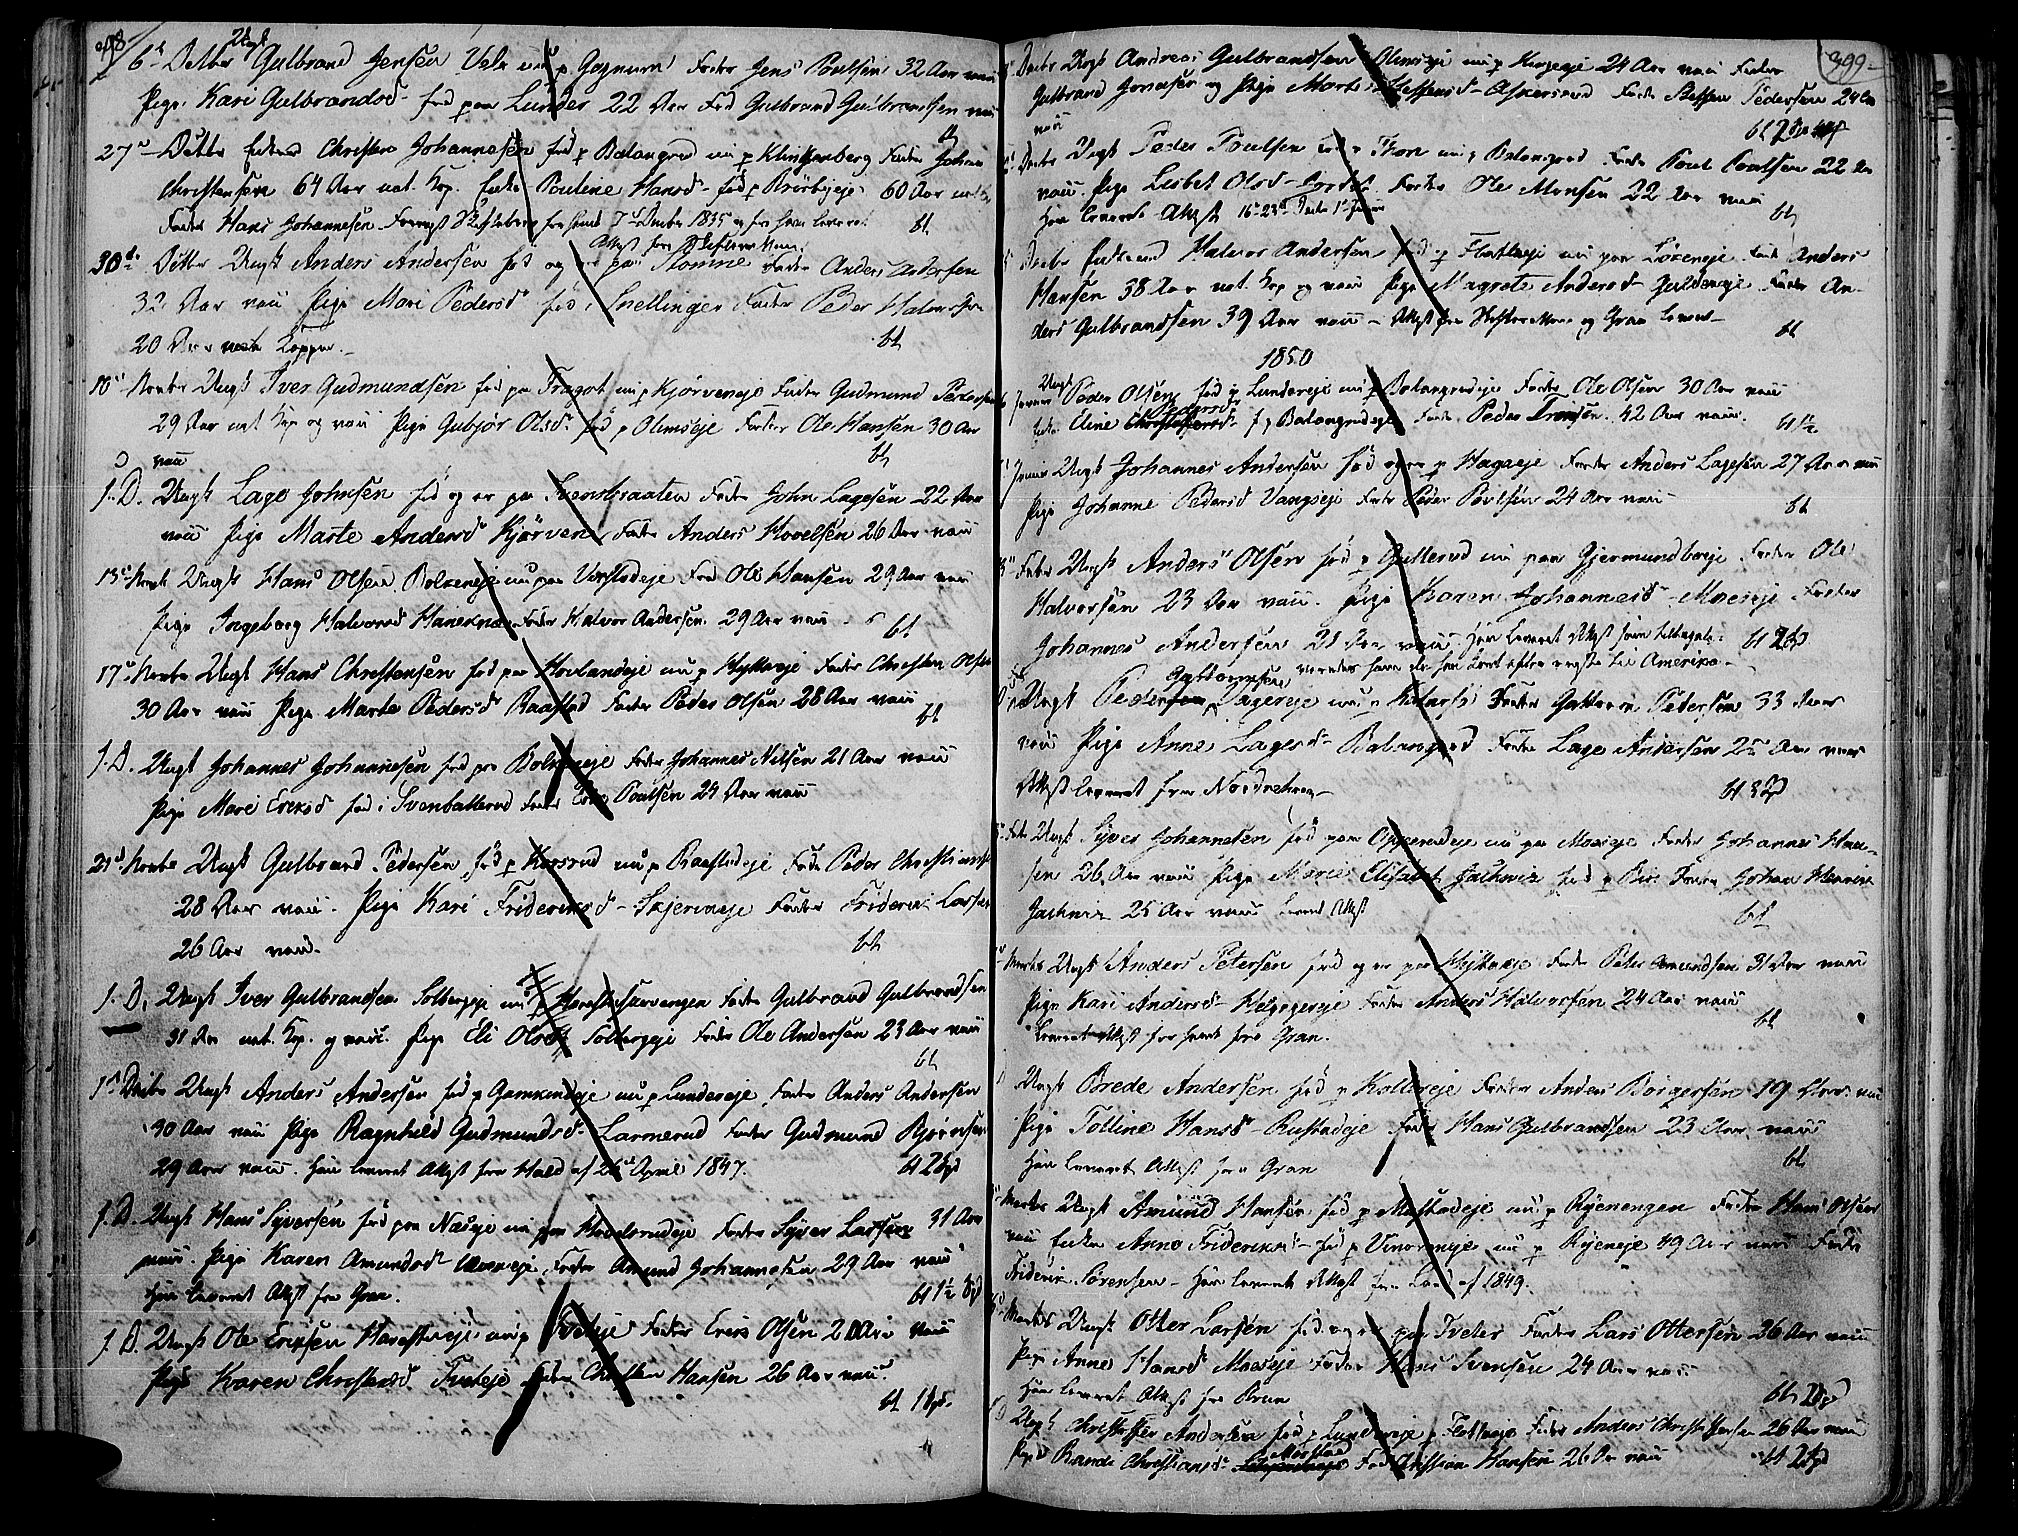 SAH, Jevnaker prestekontor, Ministerialbok nr. 4, 1800-1861, s. 398-399